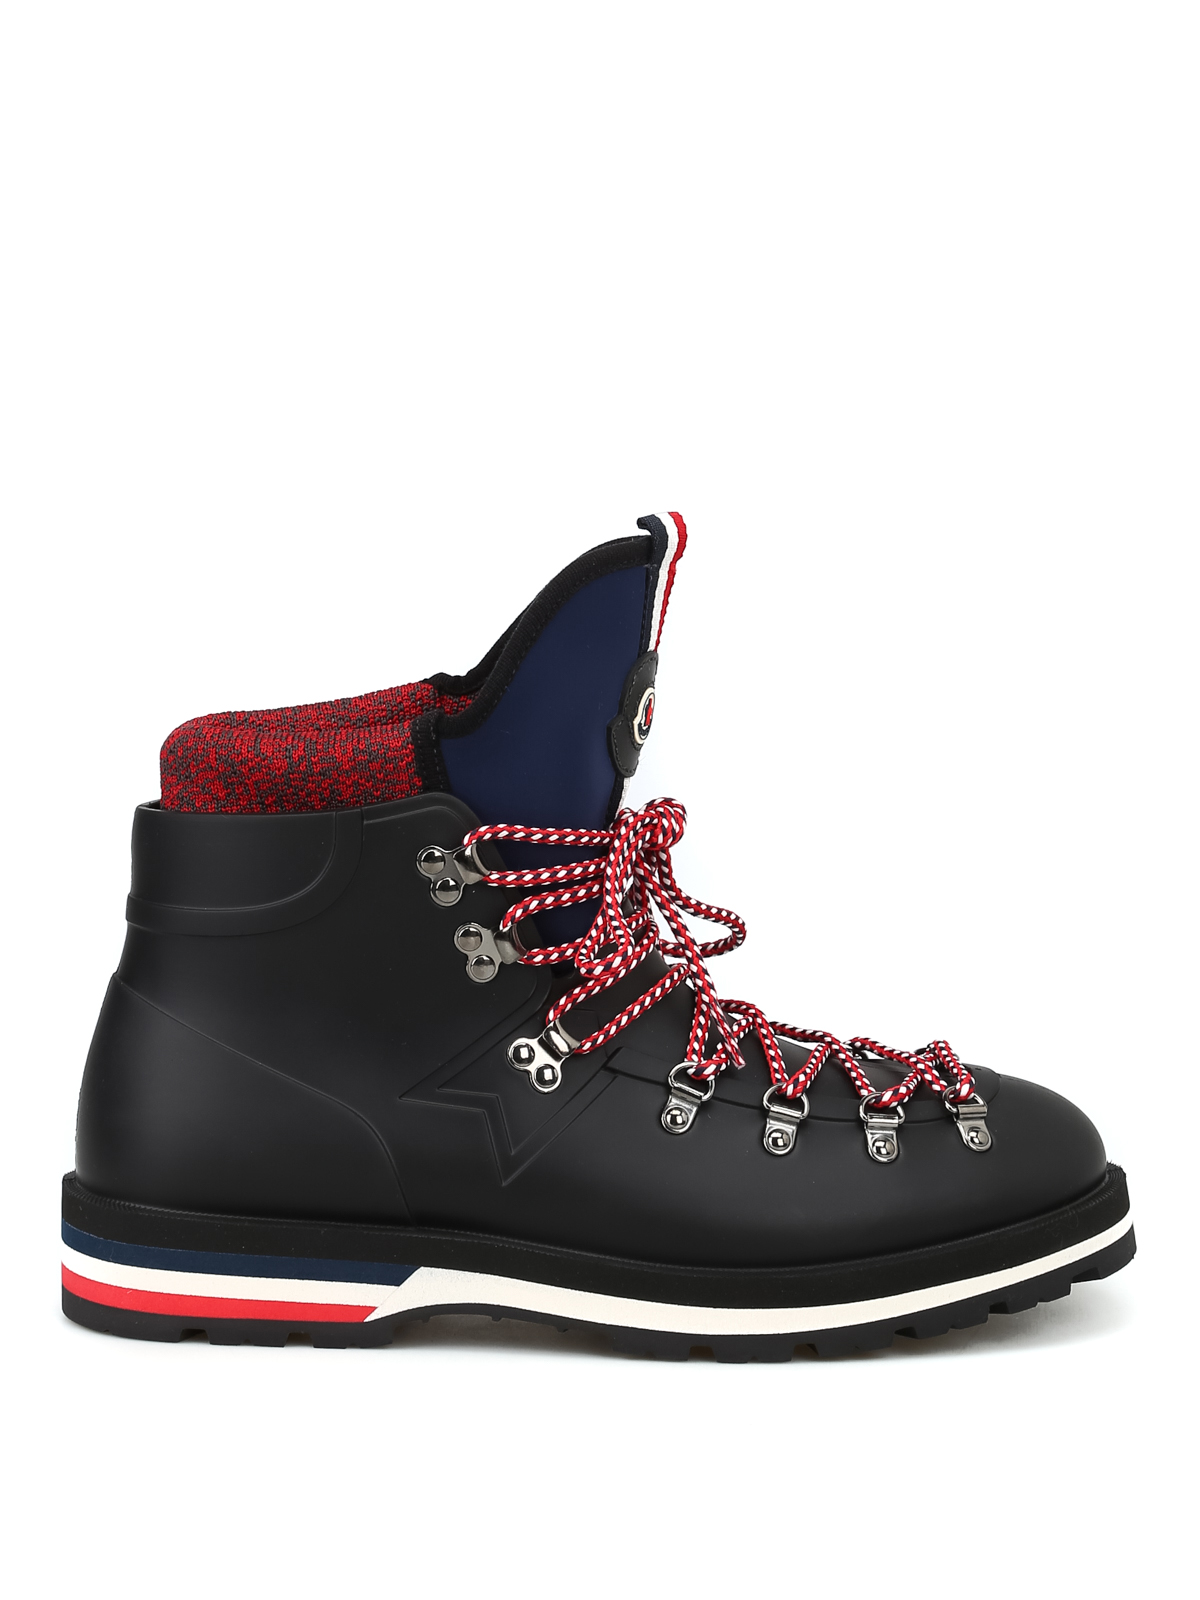 31c94540a0c Moncler - Henoc rubber lace-up hiking boots - ankle boots - D2 09A ...